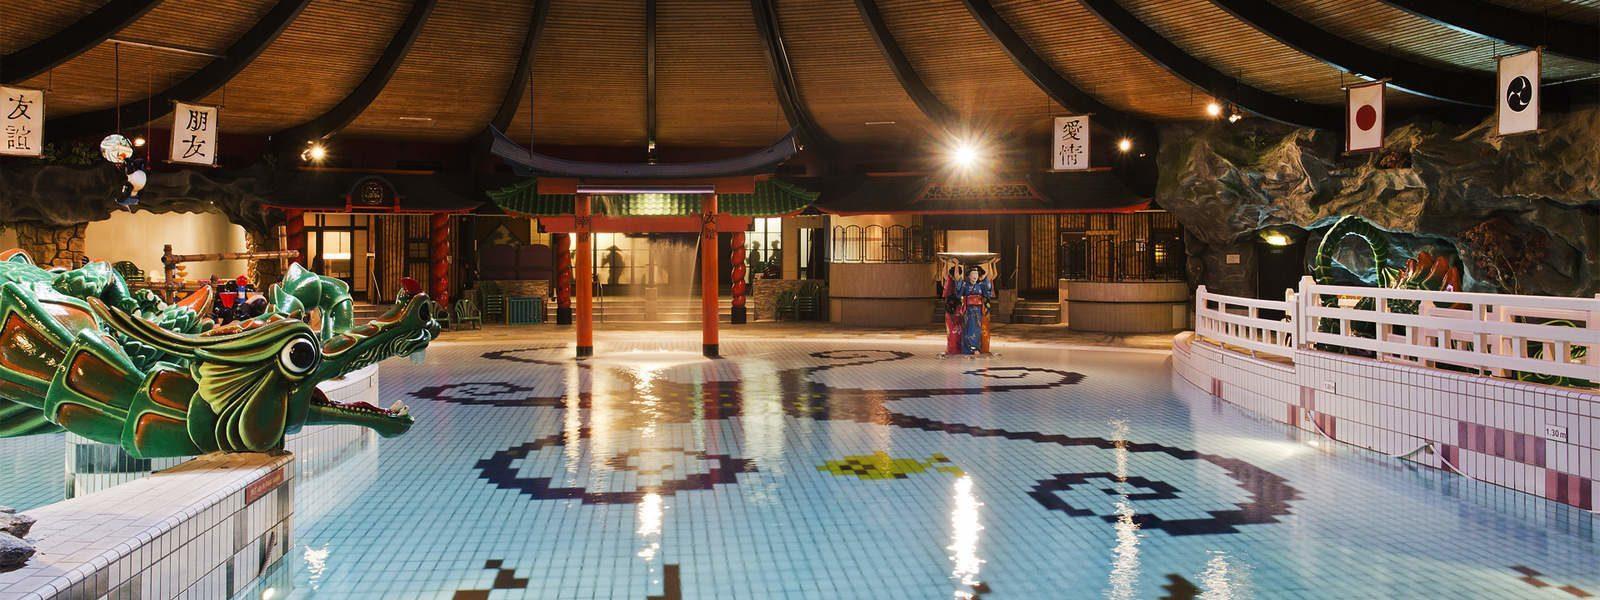 Swimming Paradise Bonte Wever